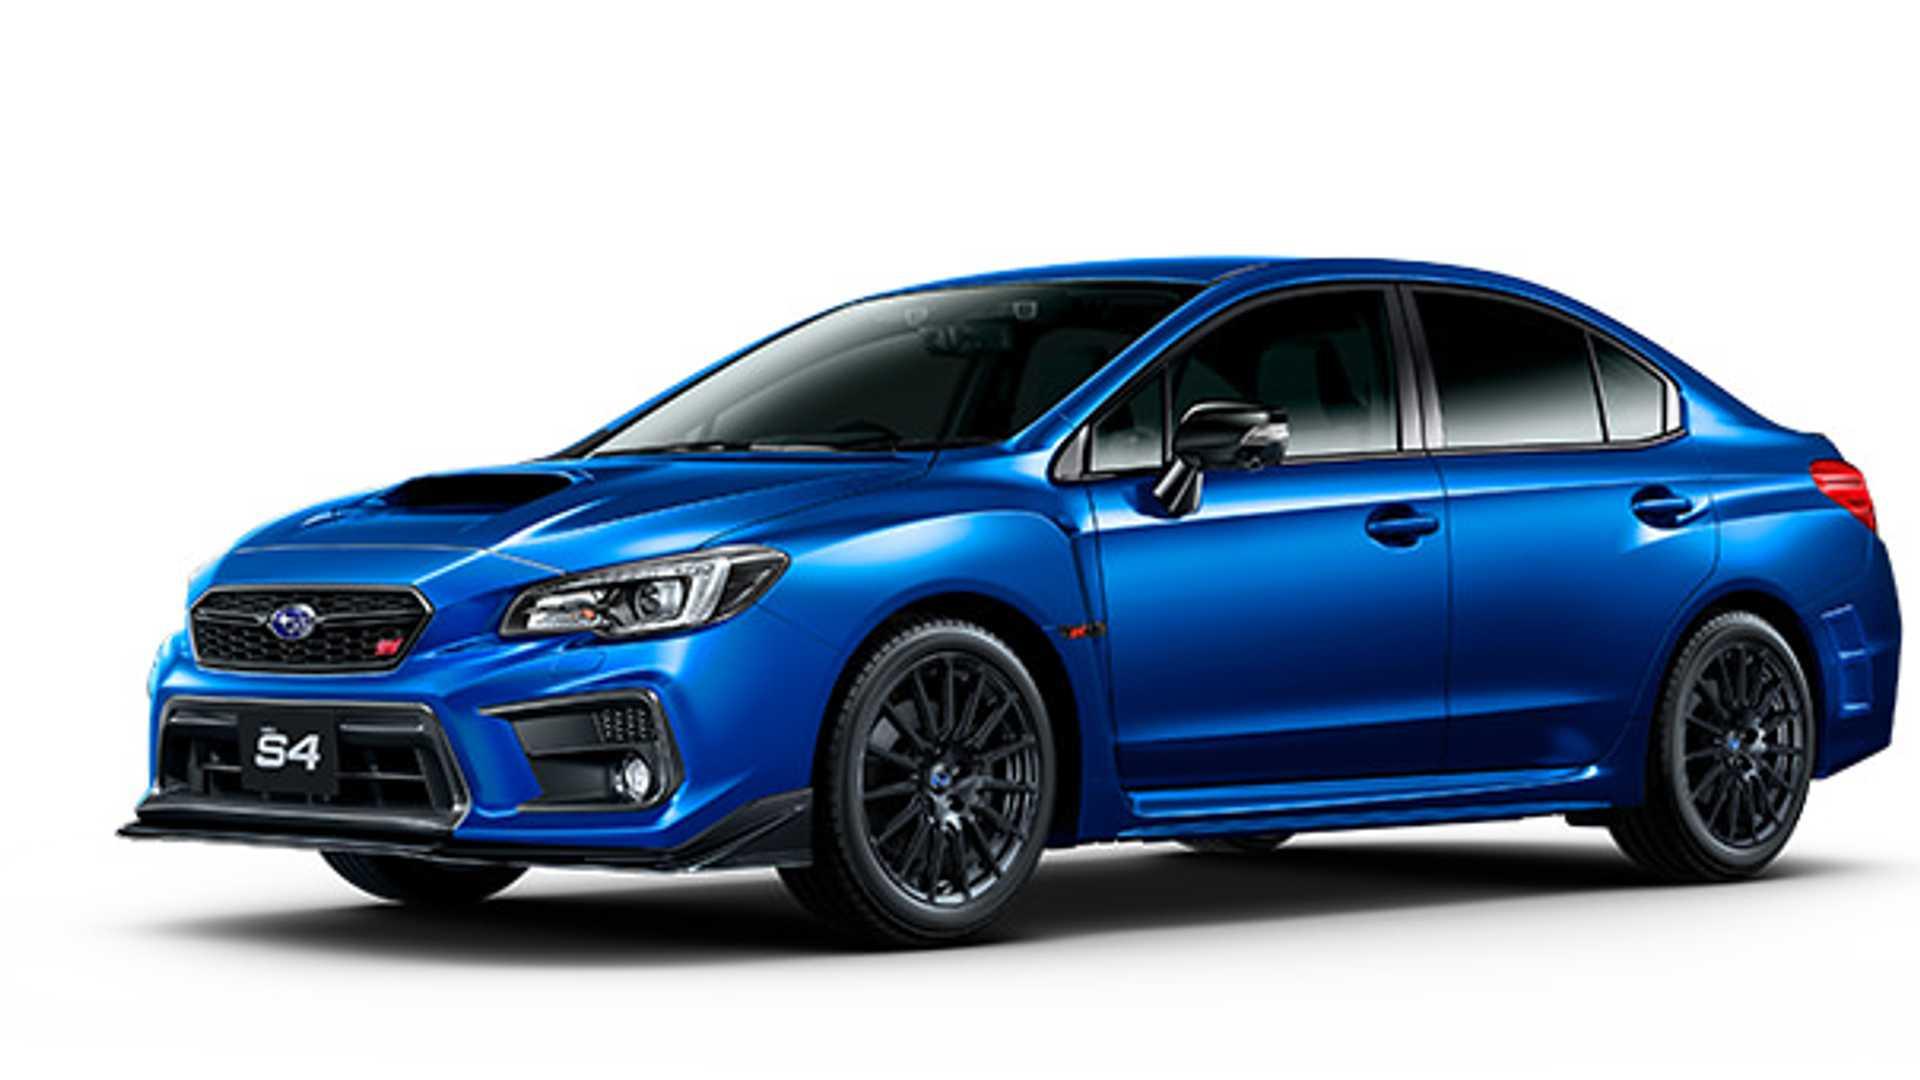 Subaru-WRX-S4-STI-Sport-Sharp-4